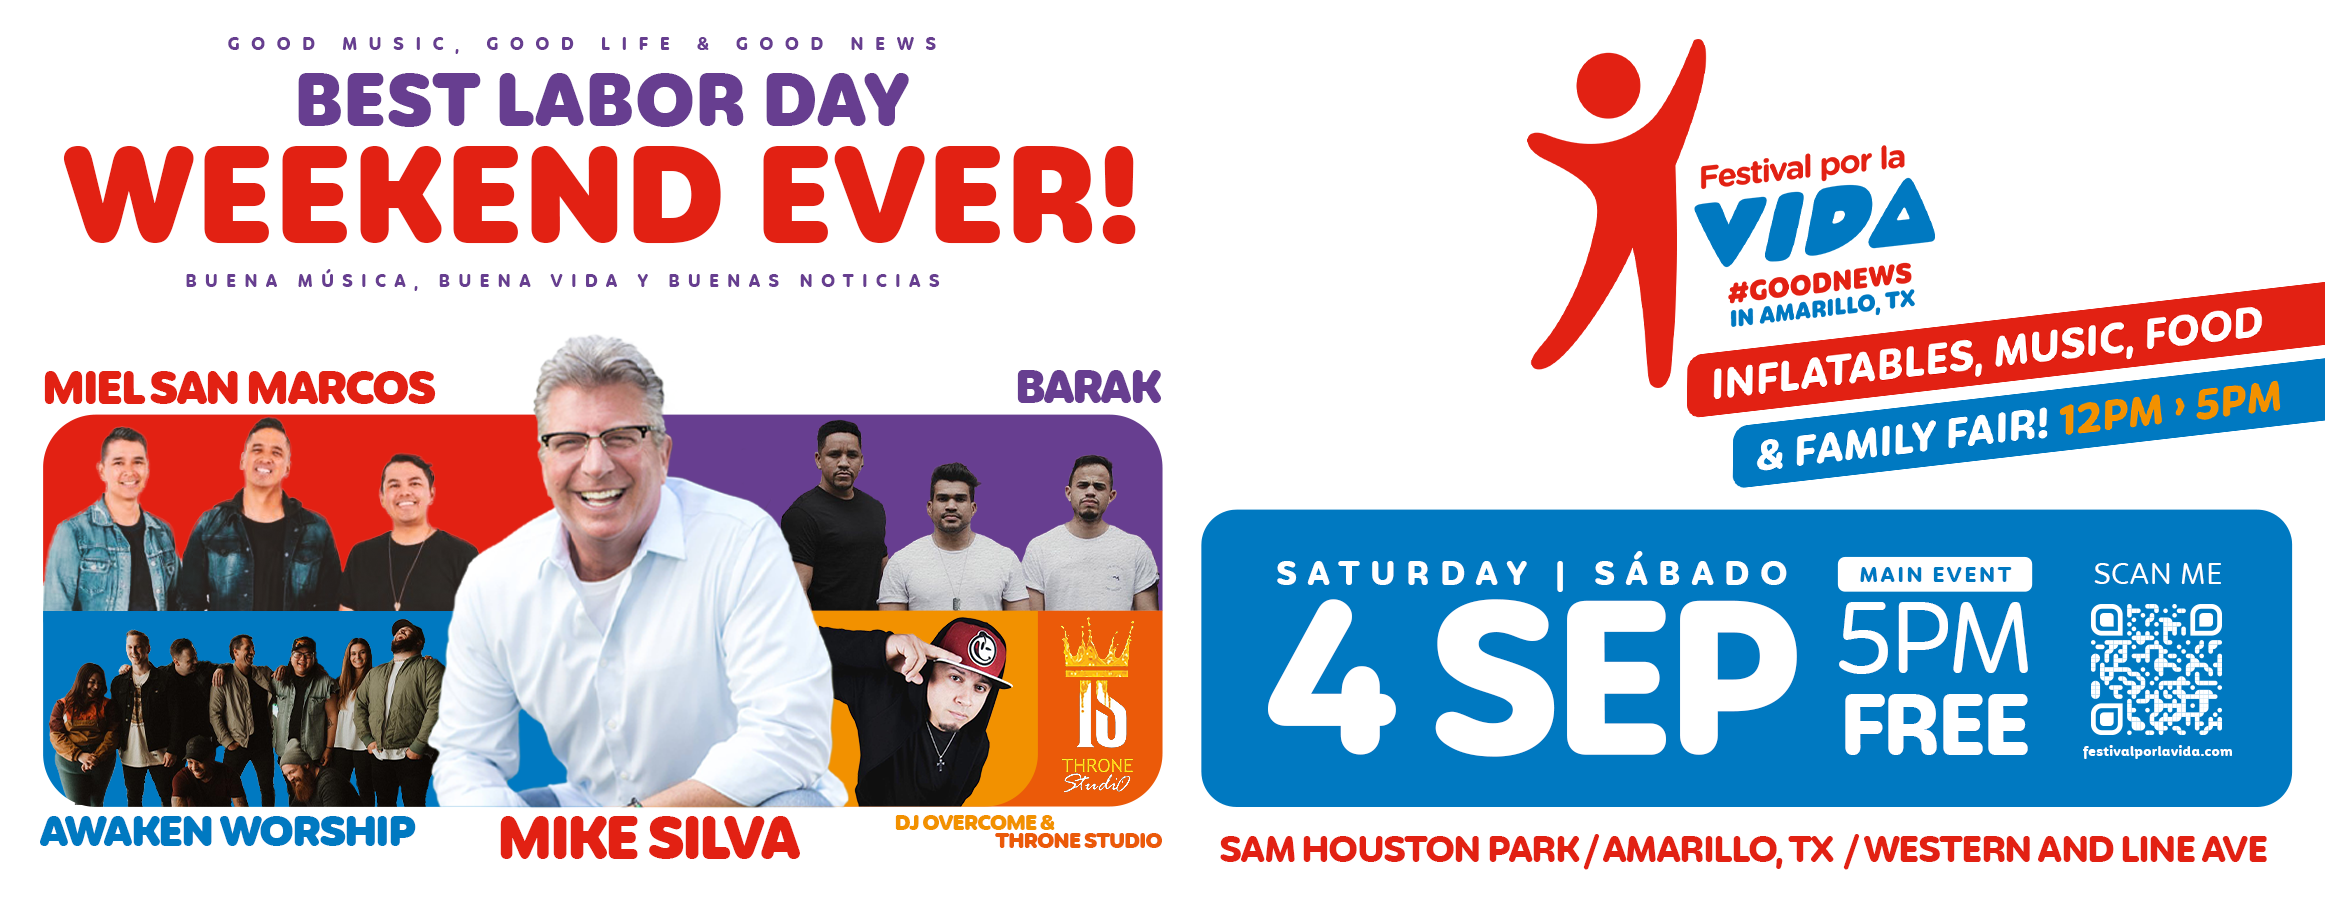 Save The Date! Festival Por La Vida